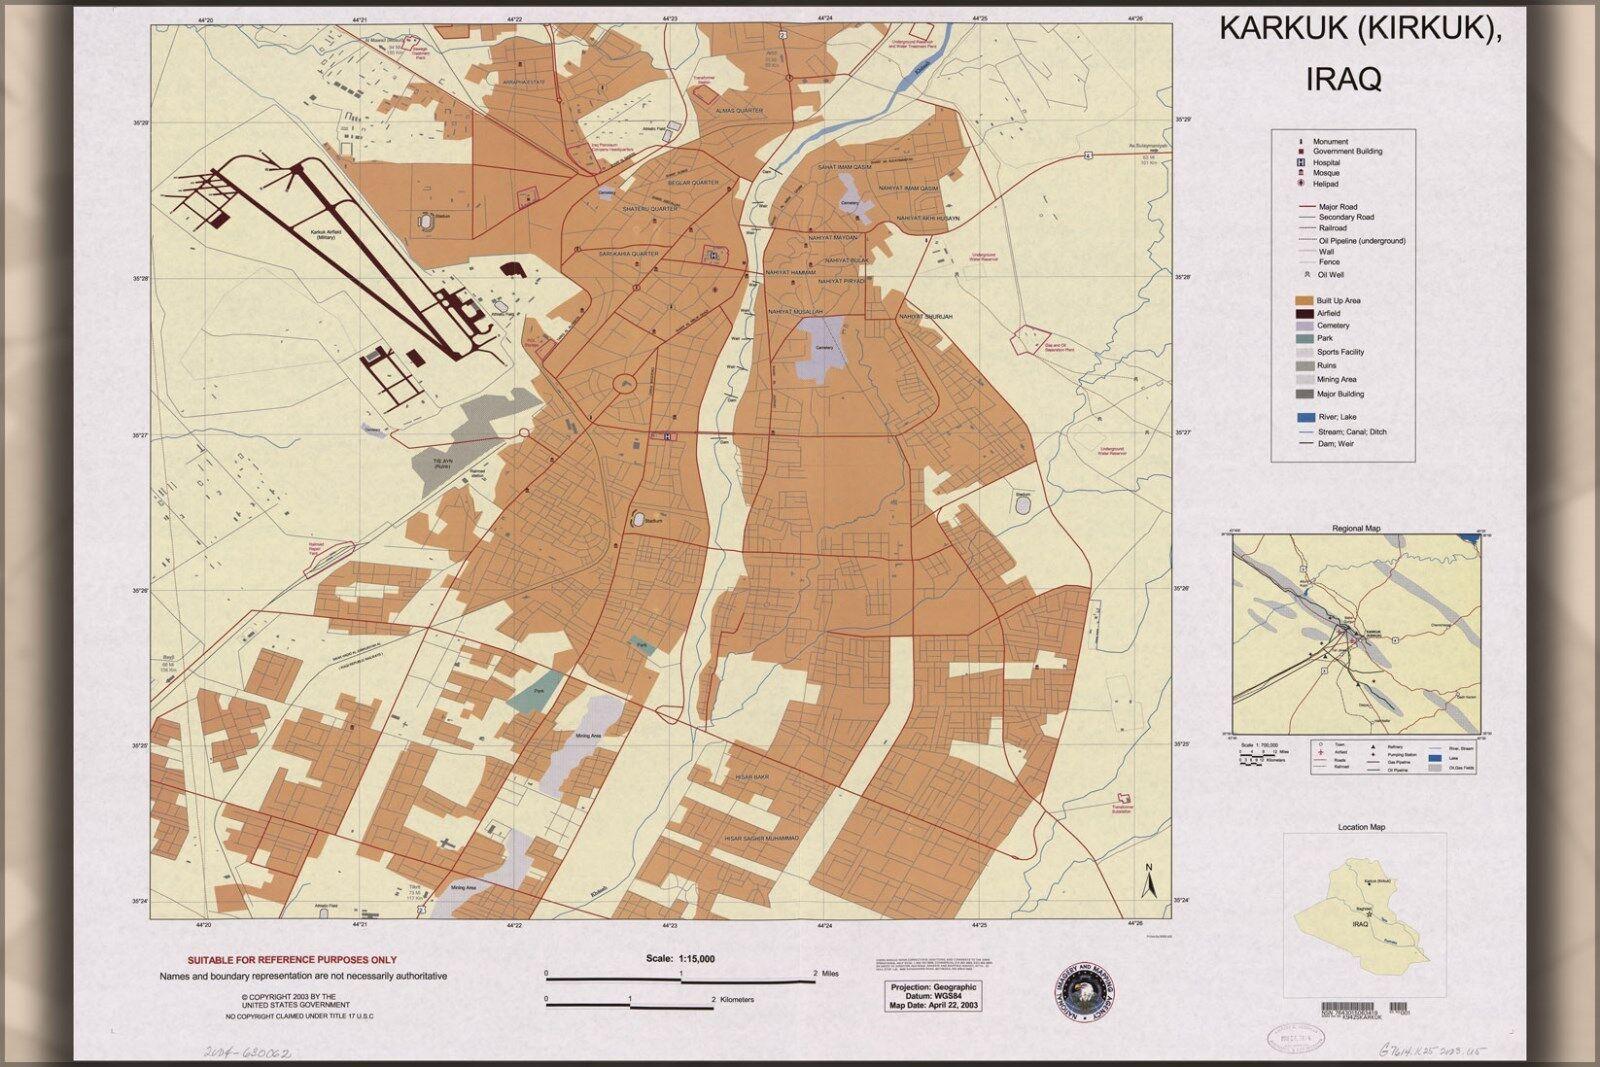 Plakat, Viele Größen; Karte von Karkuk Kirkuk, Irak